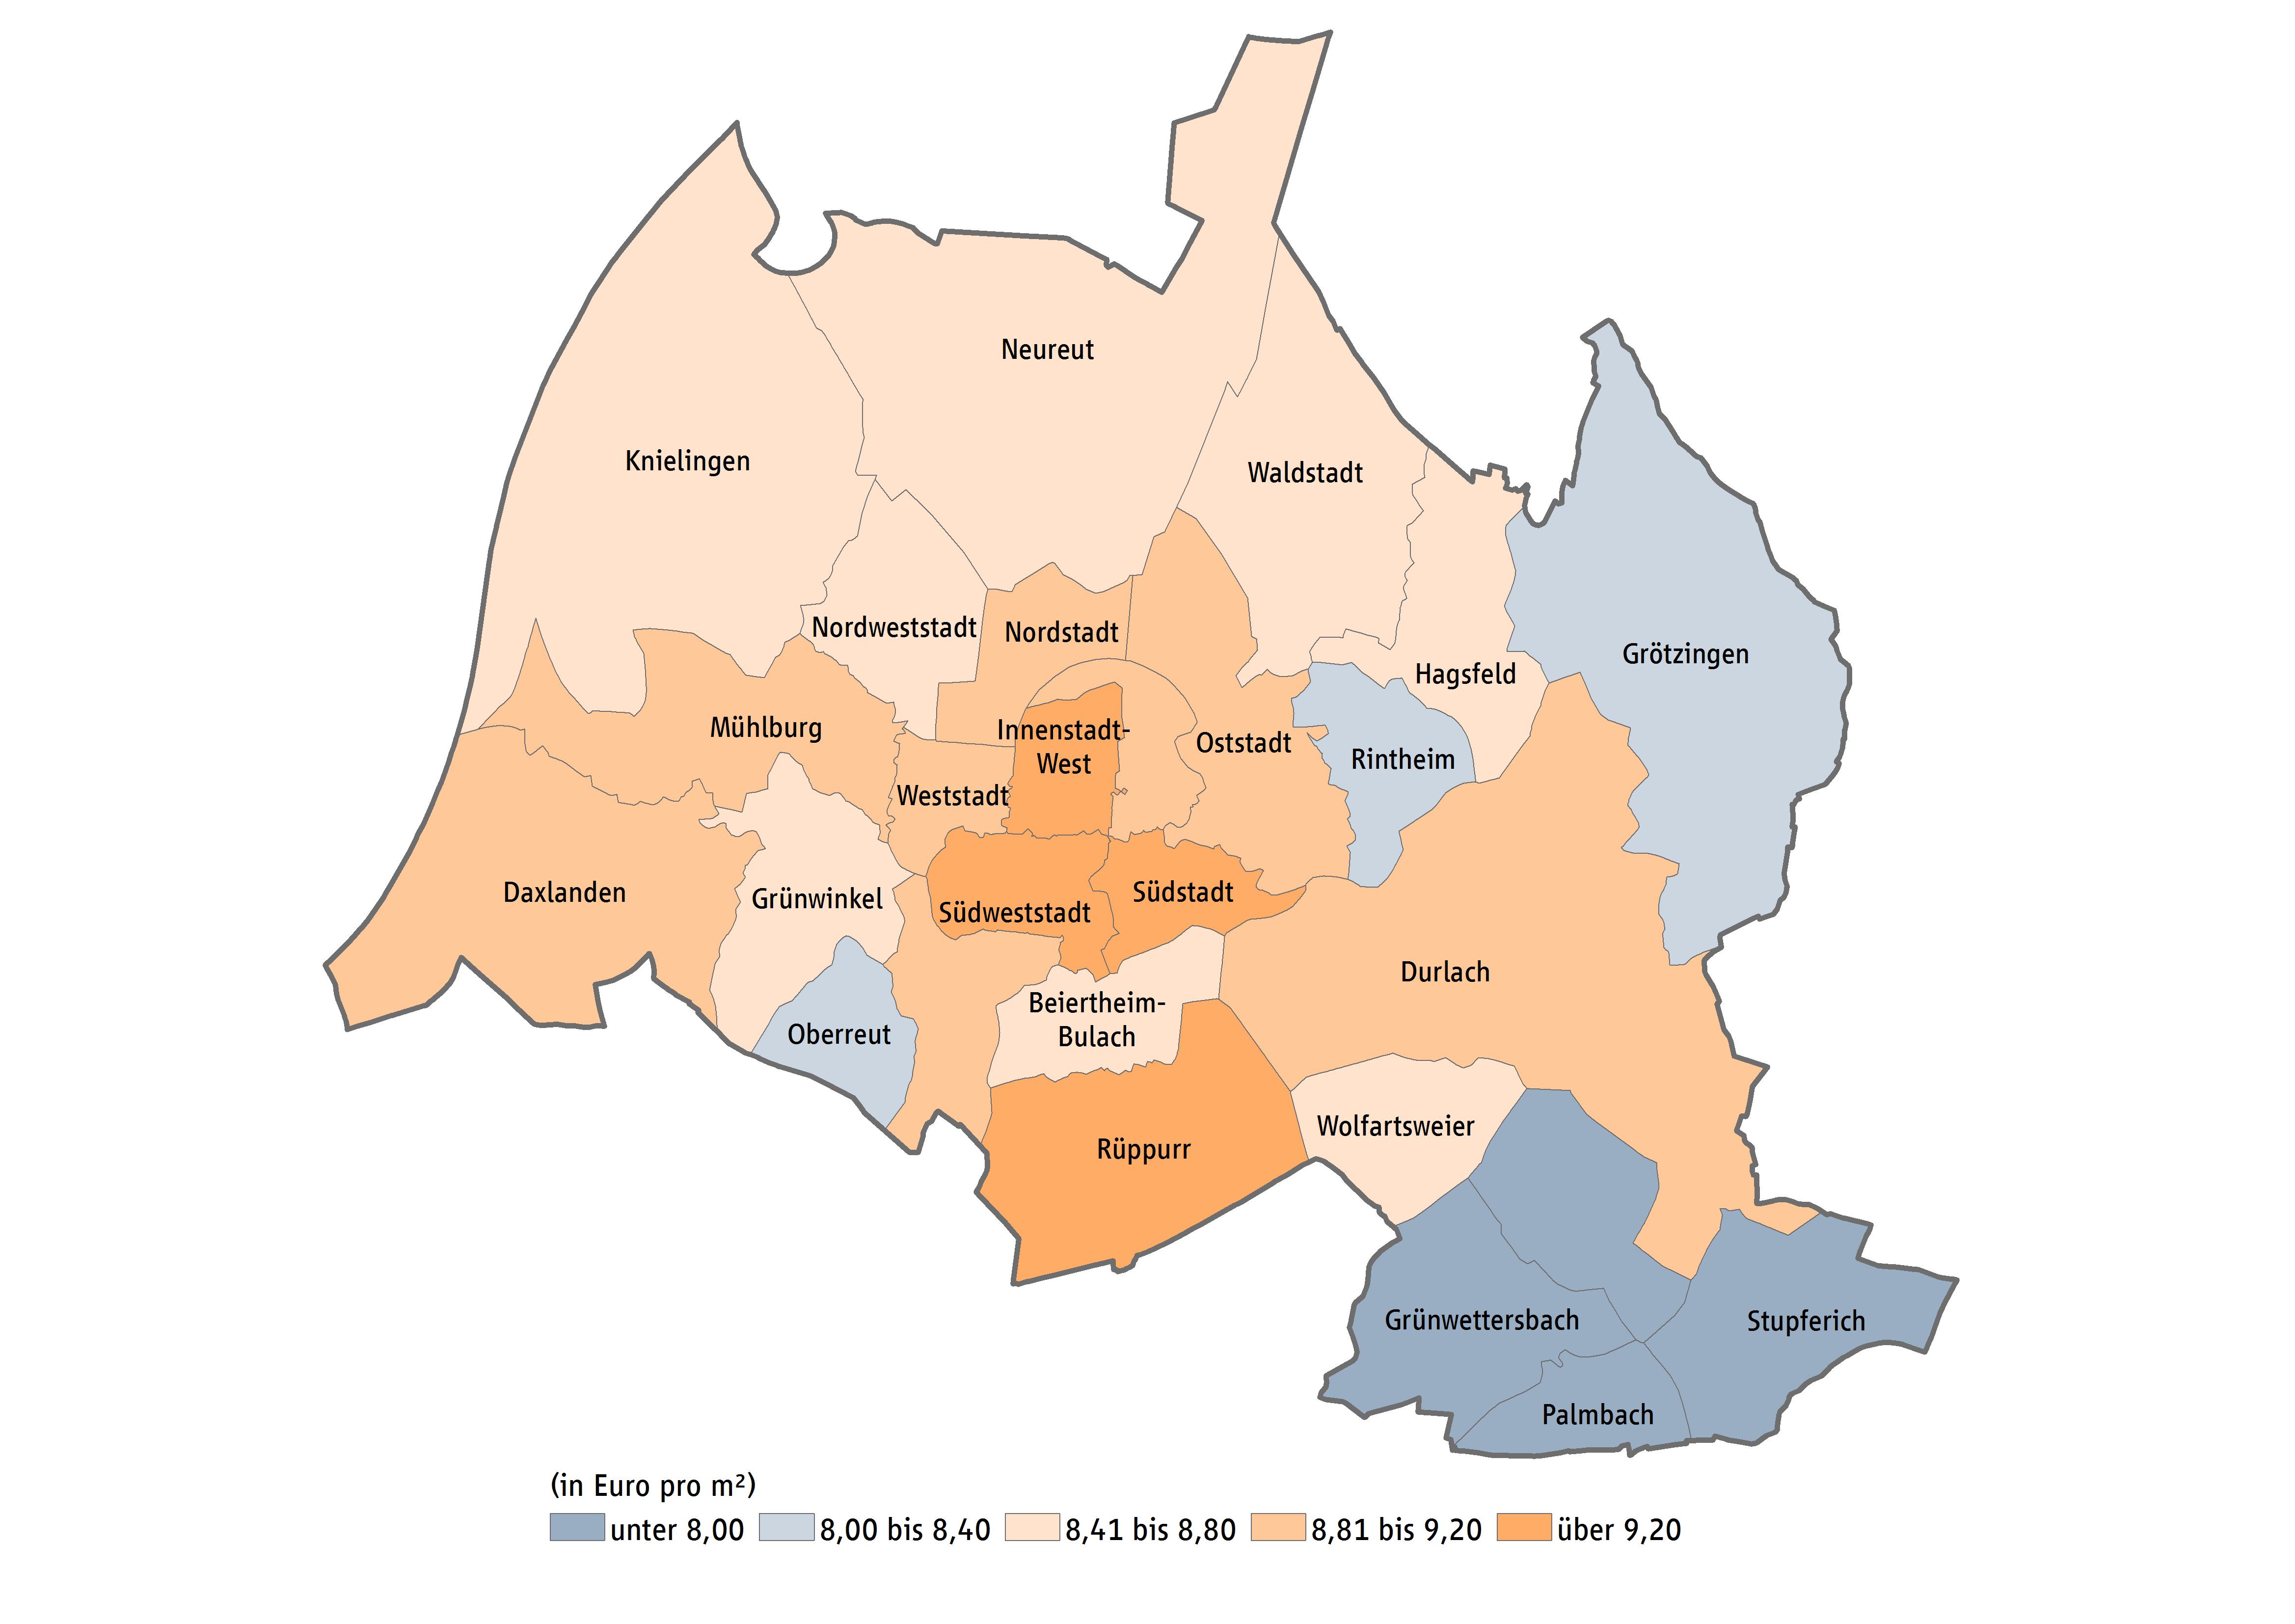 Karlsruhe Karte Umgebung.Mietspiegel Karlsruhe Mietpreise Immobilienpreise